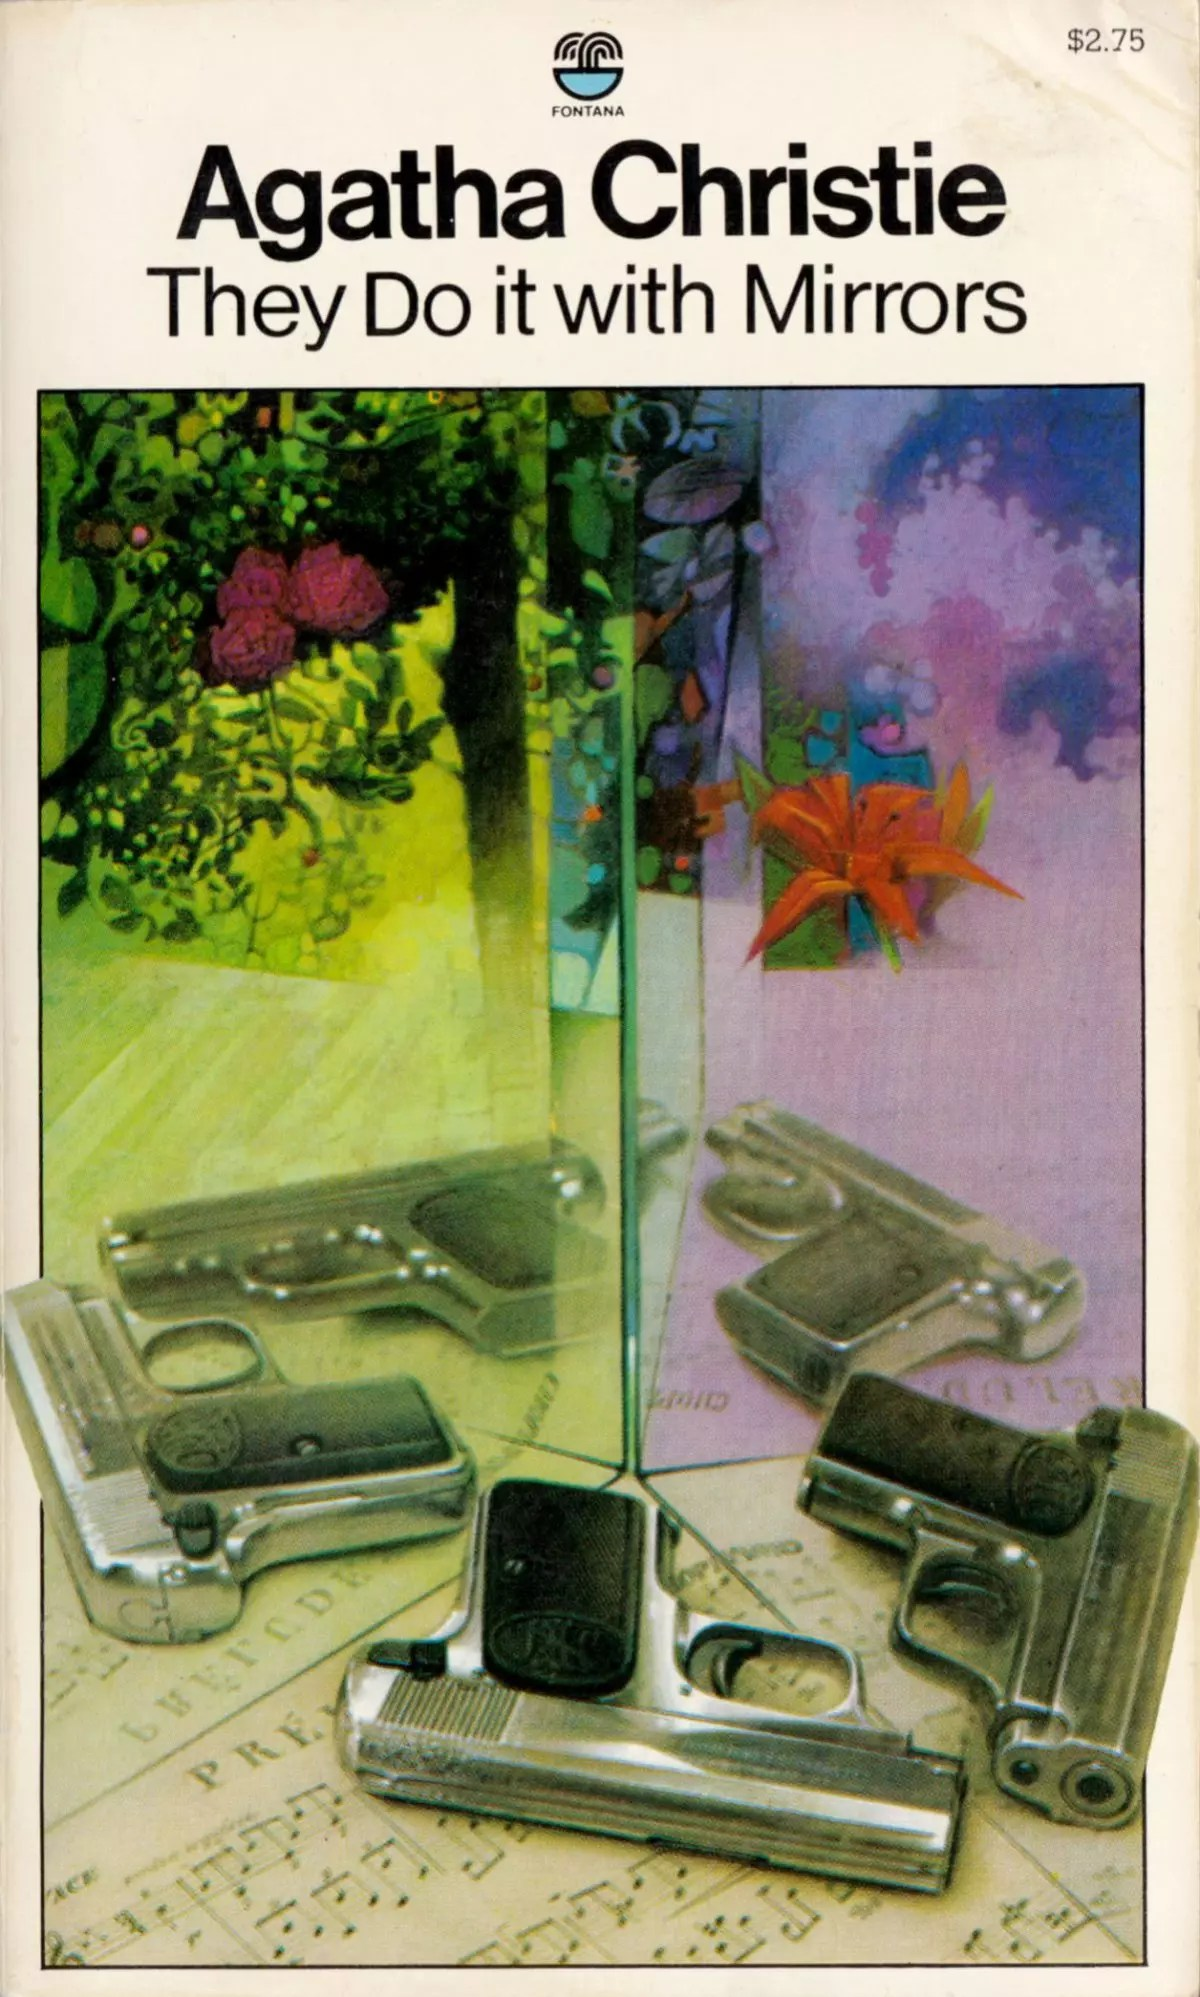 Agatha Christie Tom Adams They Do It With Mirrors Fontana 1981